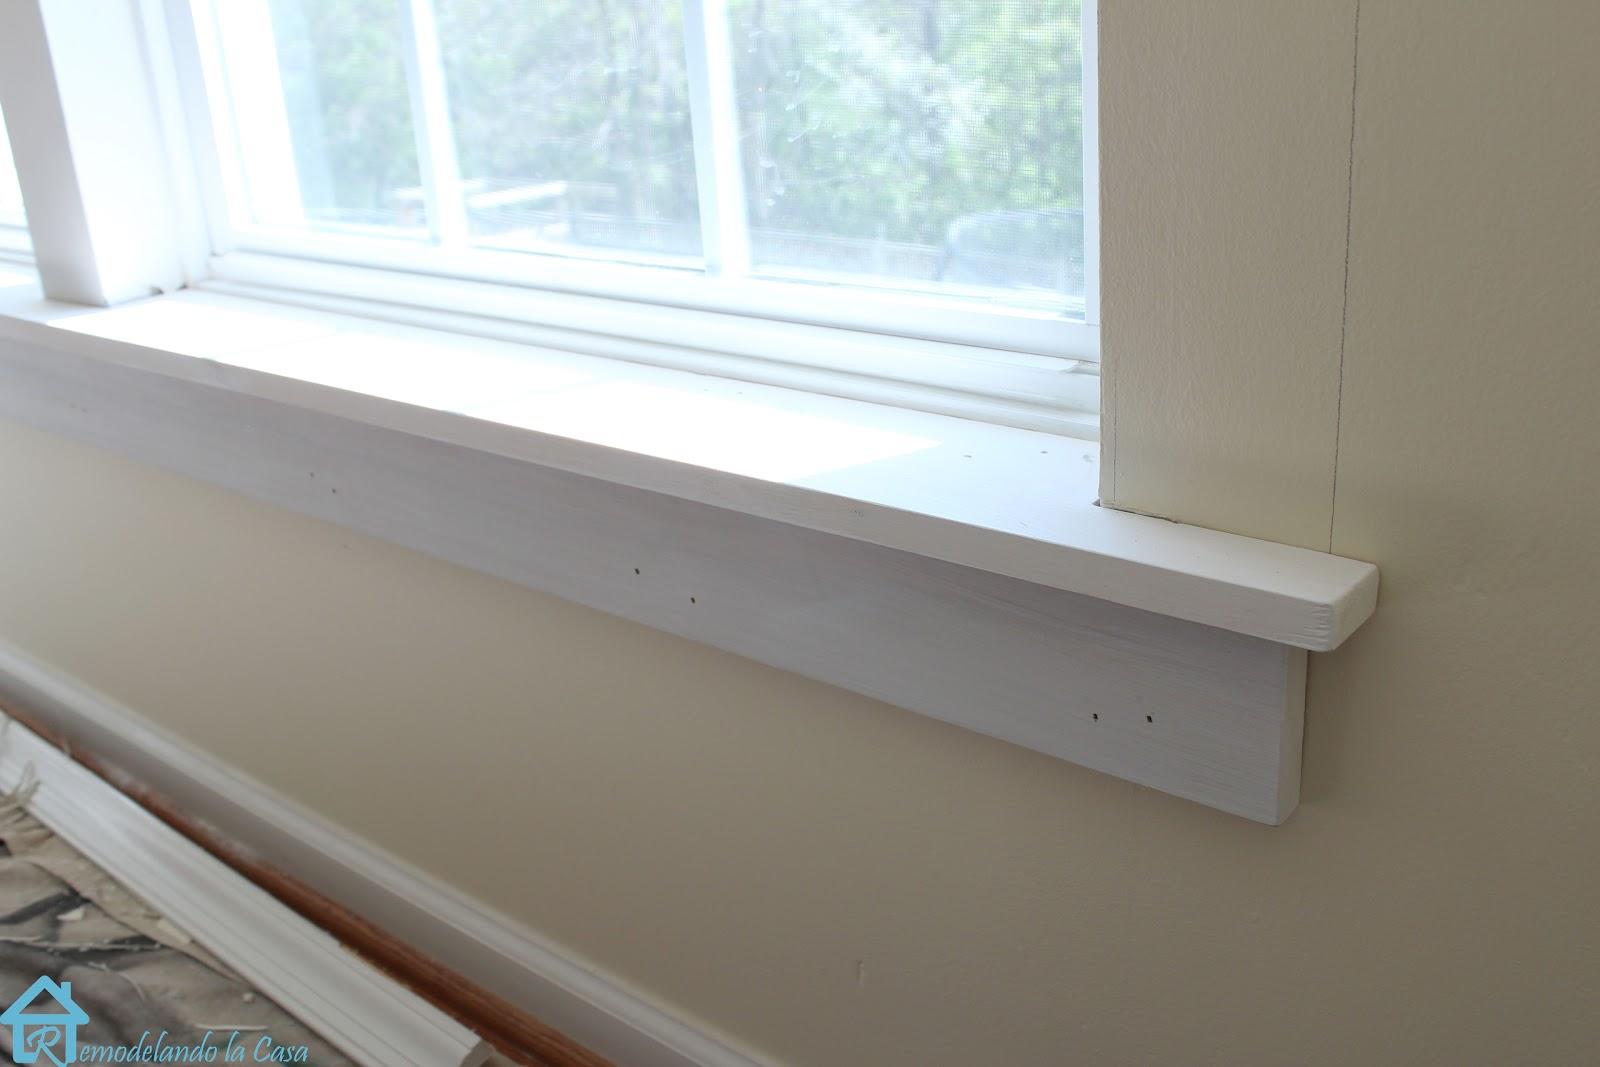 How to Install Trim on a Double Window - Remodelando la Casa